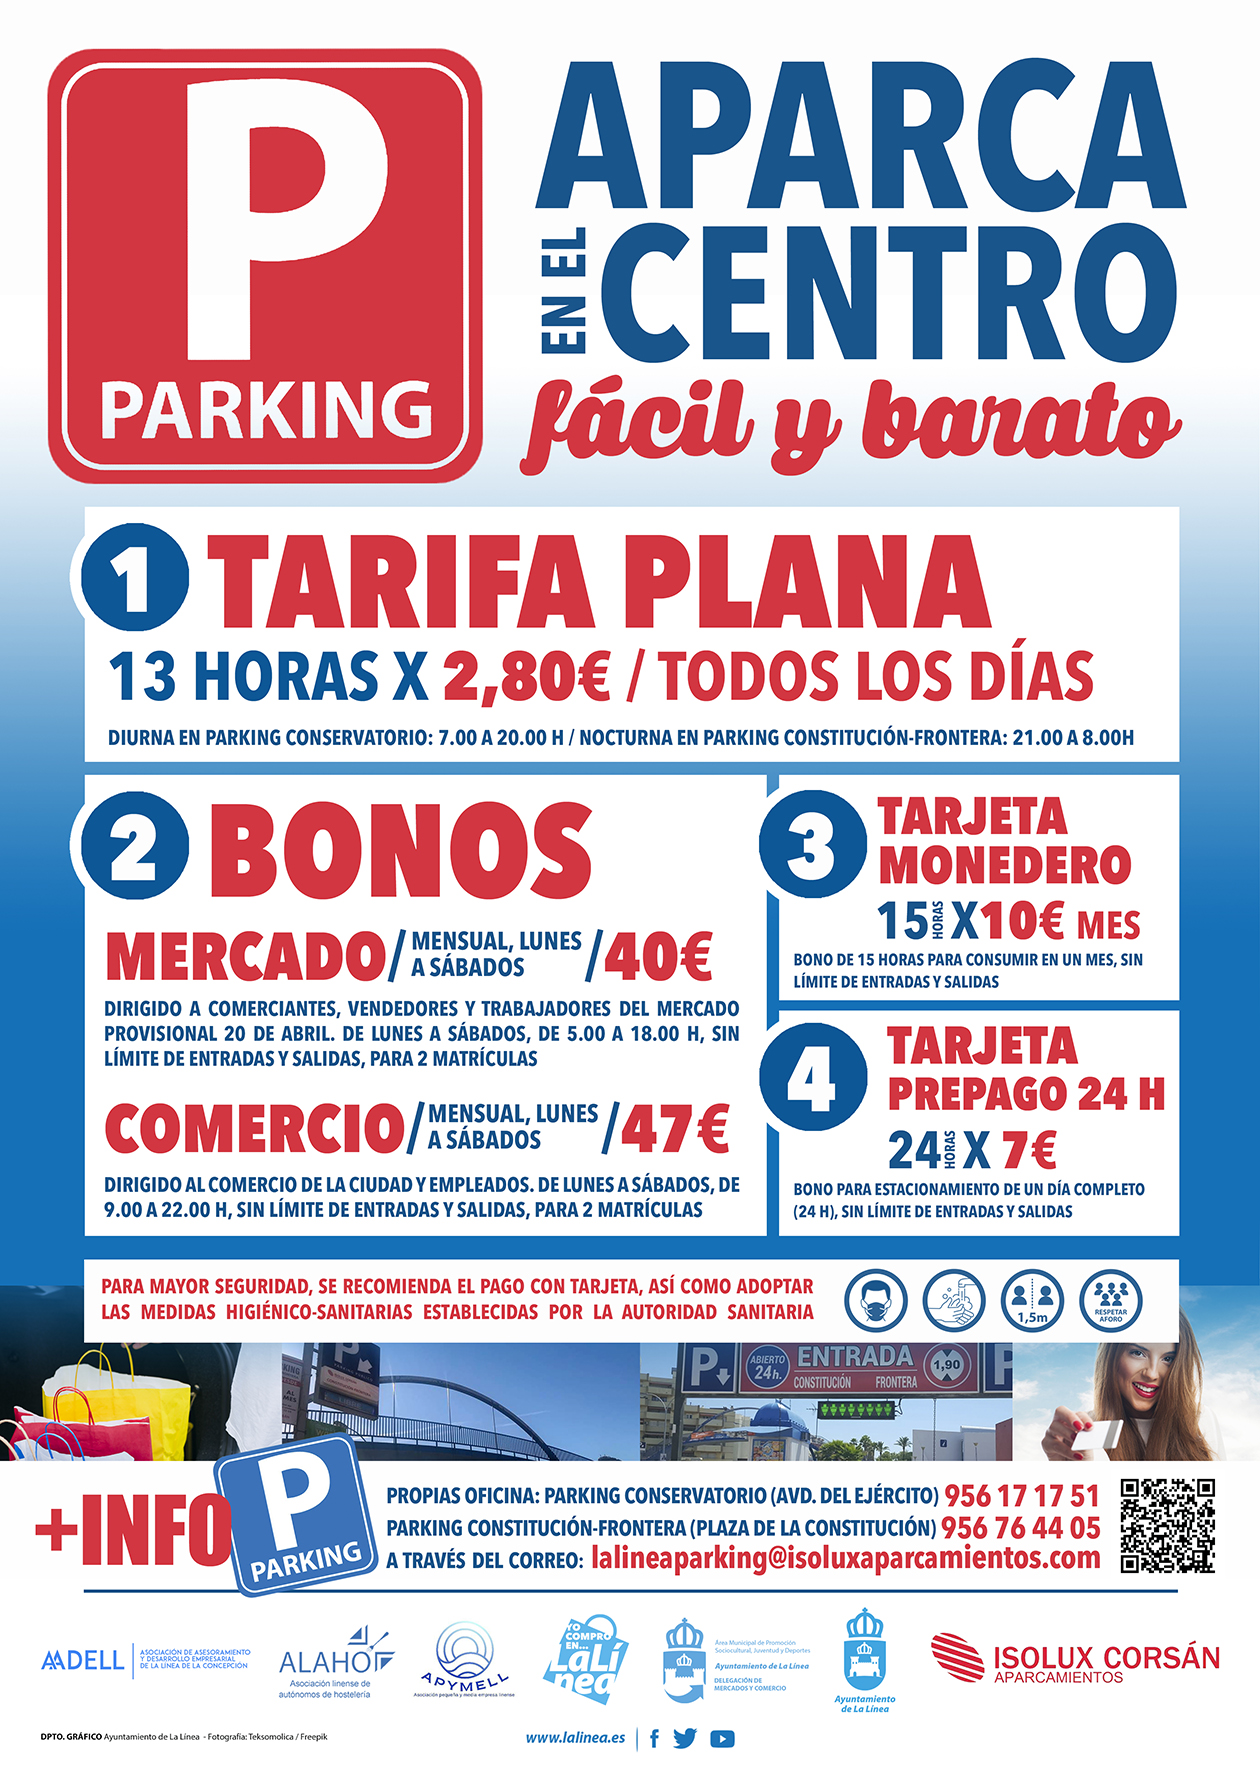 Tarifa plana parking